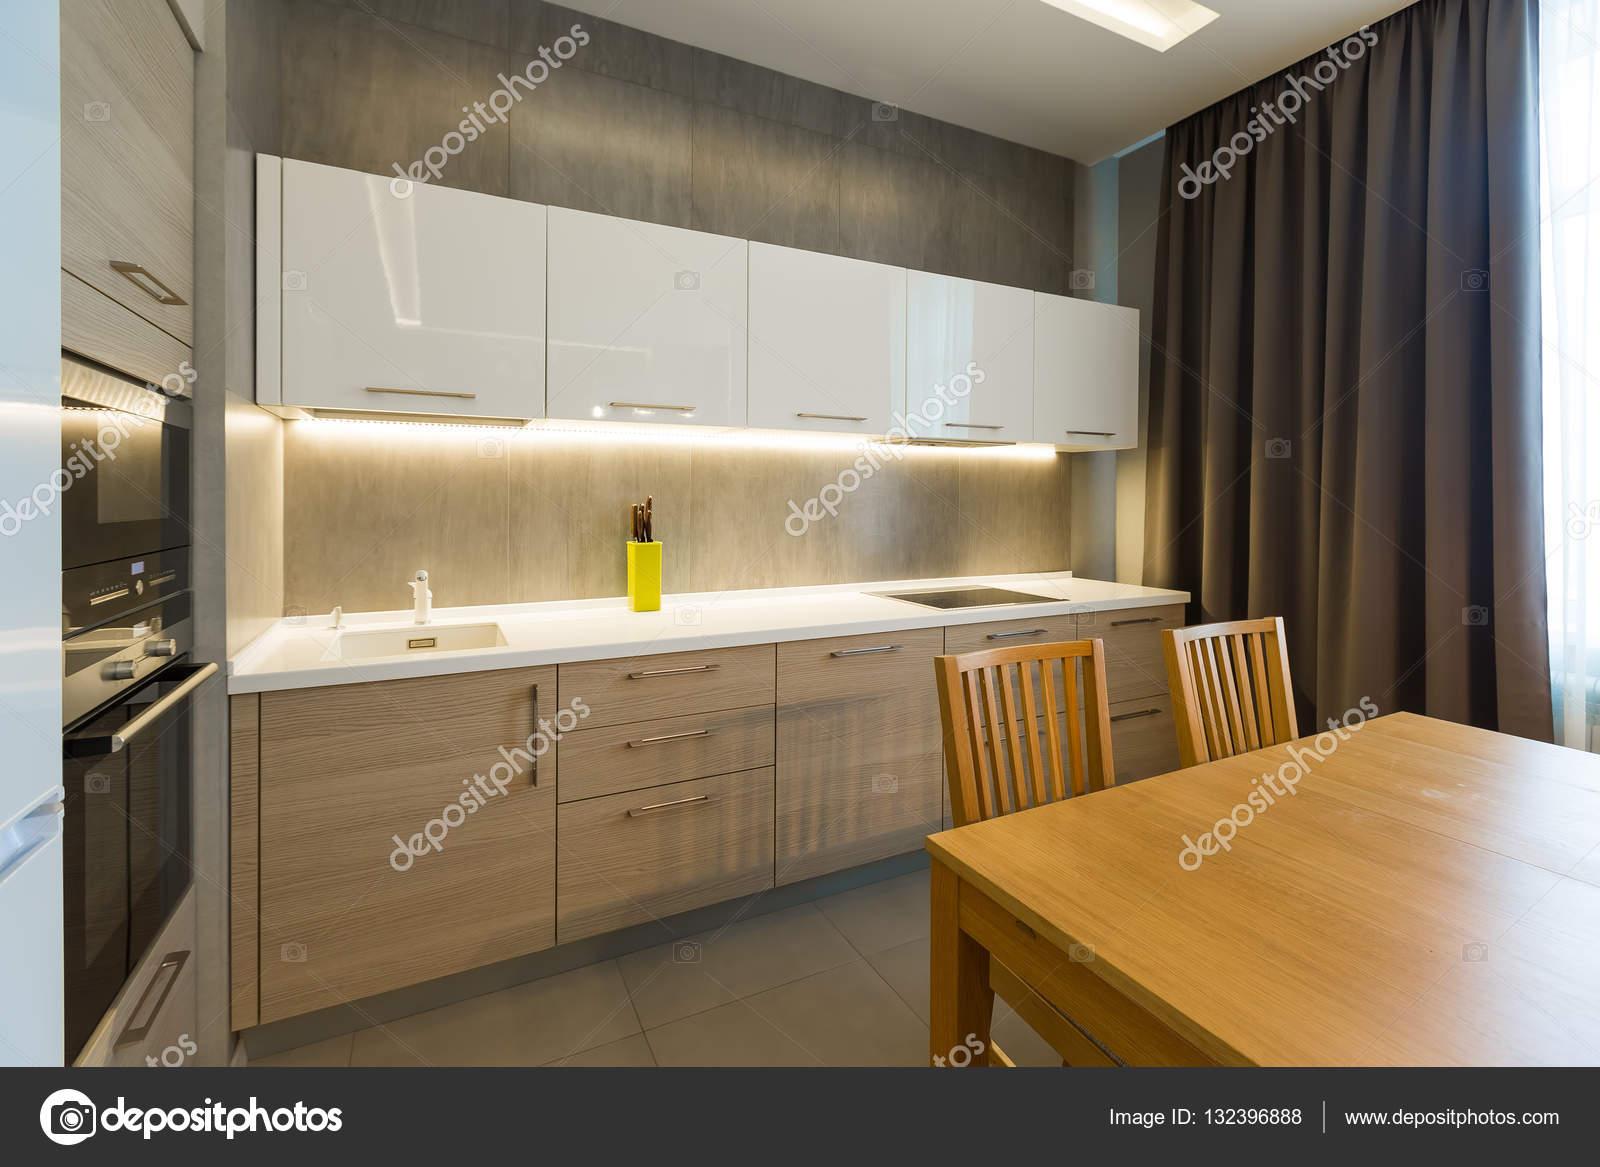 Modern Kitchen Interior In New Luxury Home Apartment Stock Photo